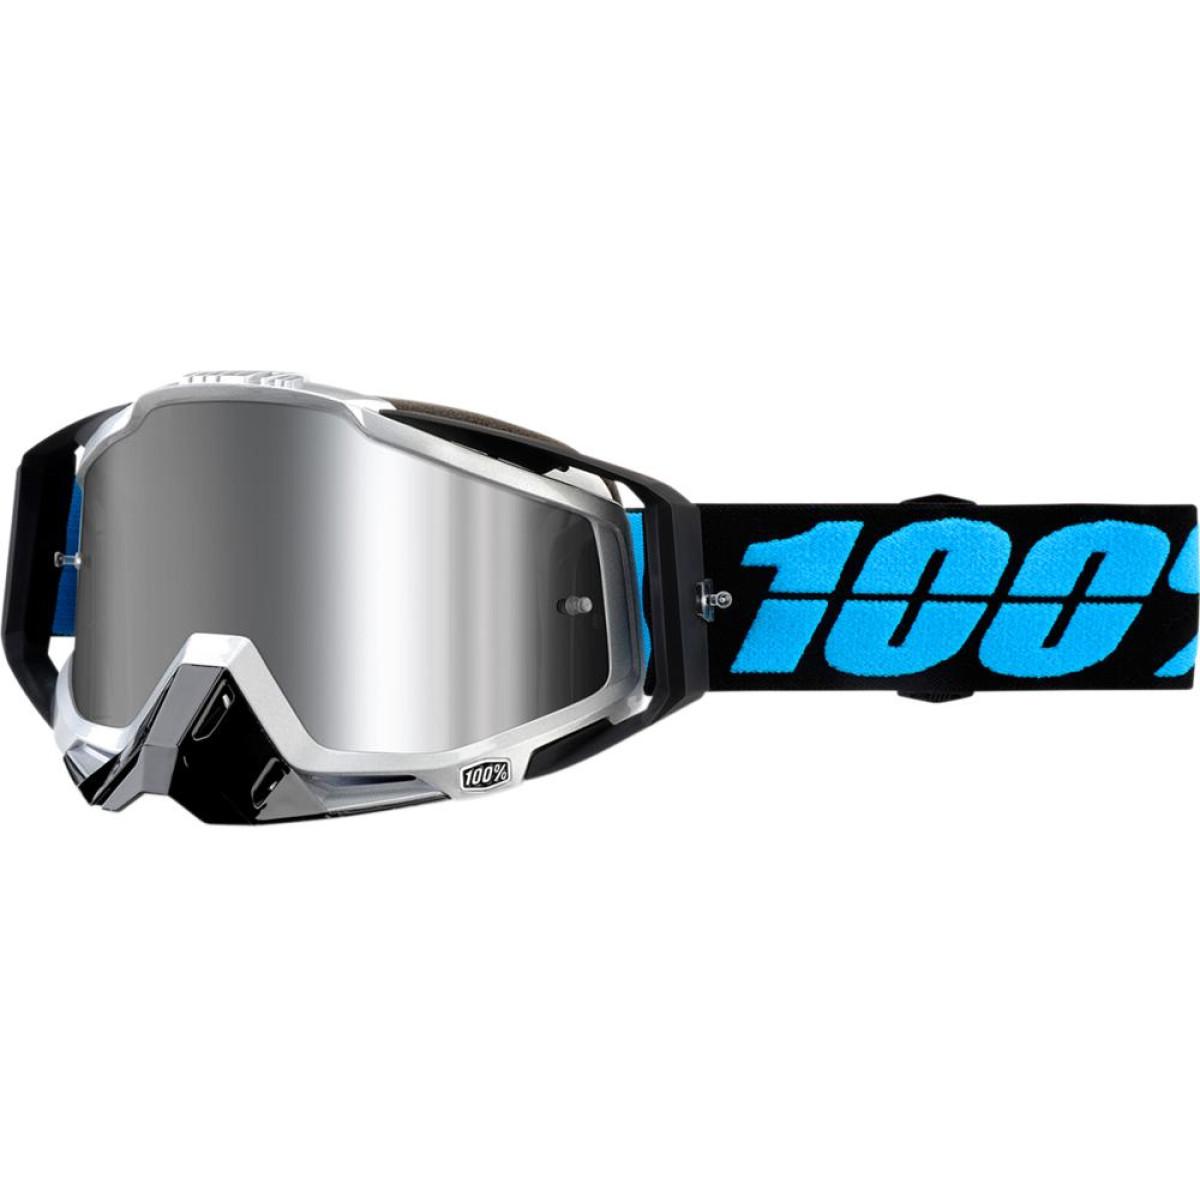 100% Crossglasögon Racecraft+ Daffed Black - Forsellmotor.se 398a4482cf66f